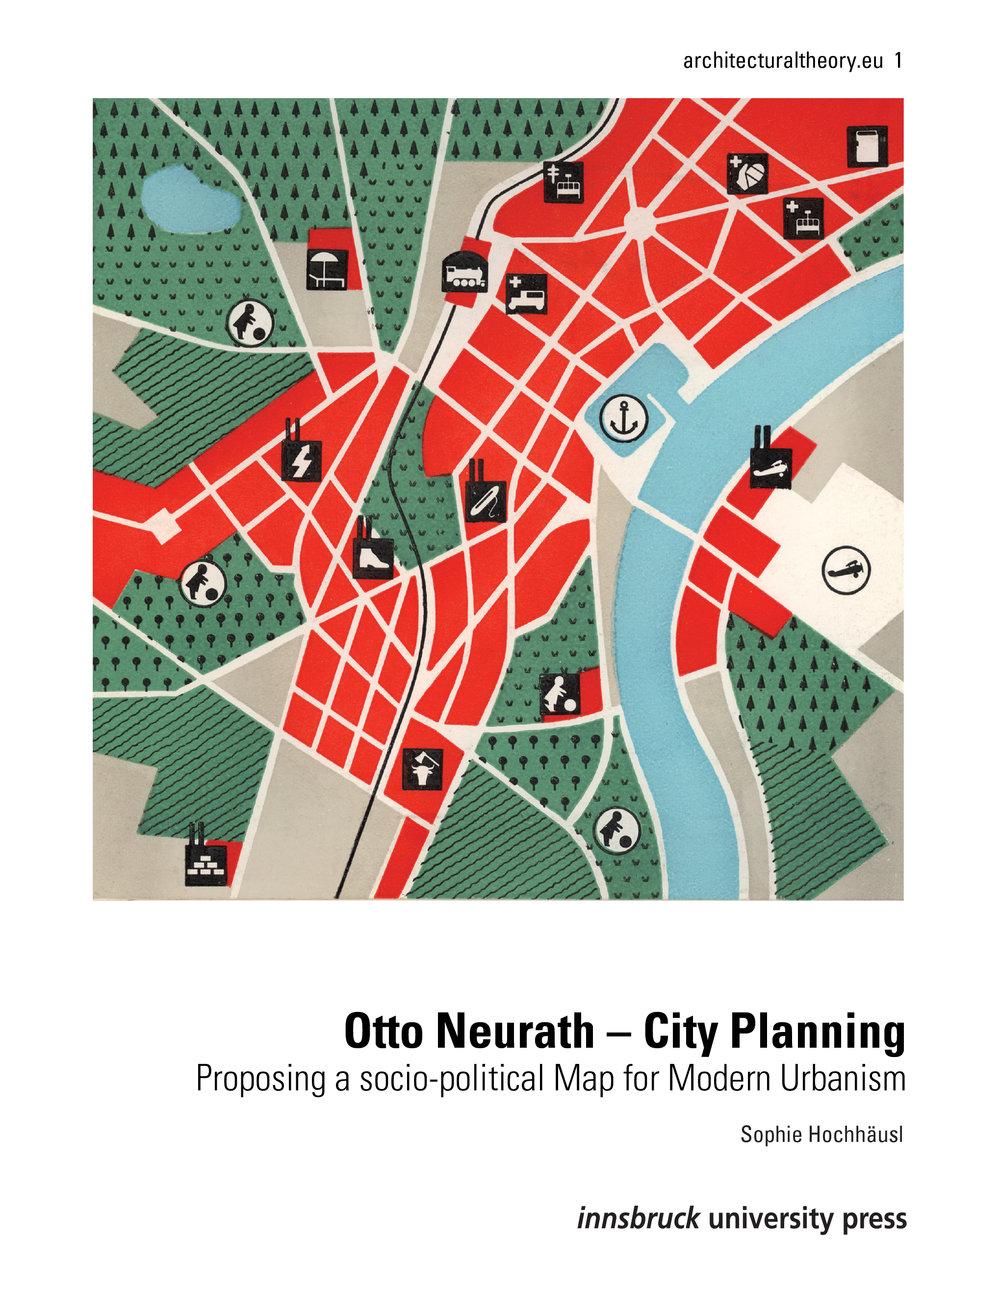 Sophie Hochhäusl, Otto Neurath – City Planning, Book Cover